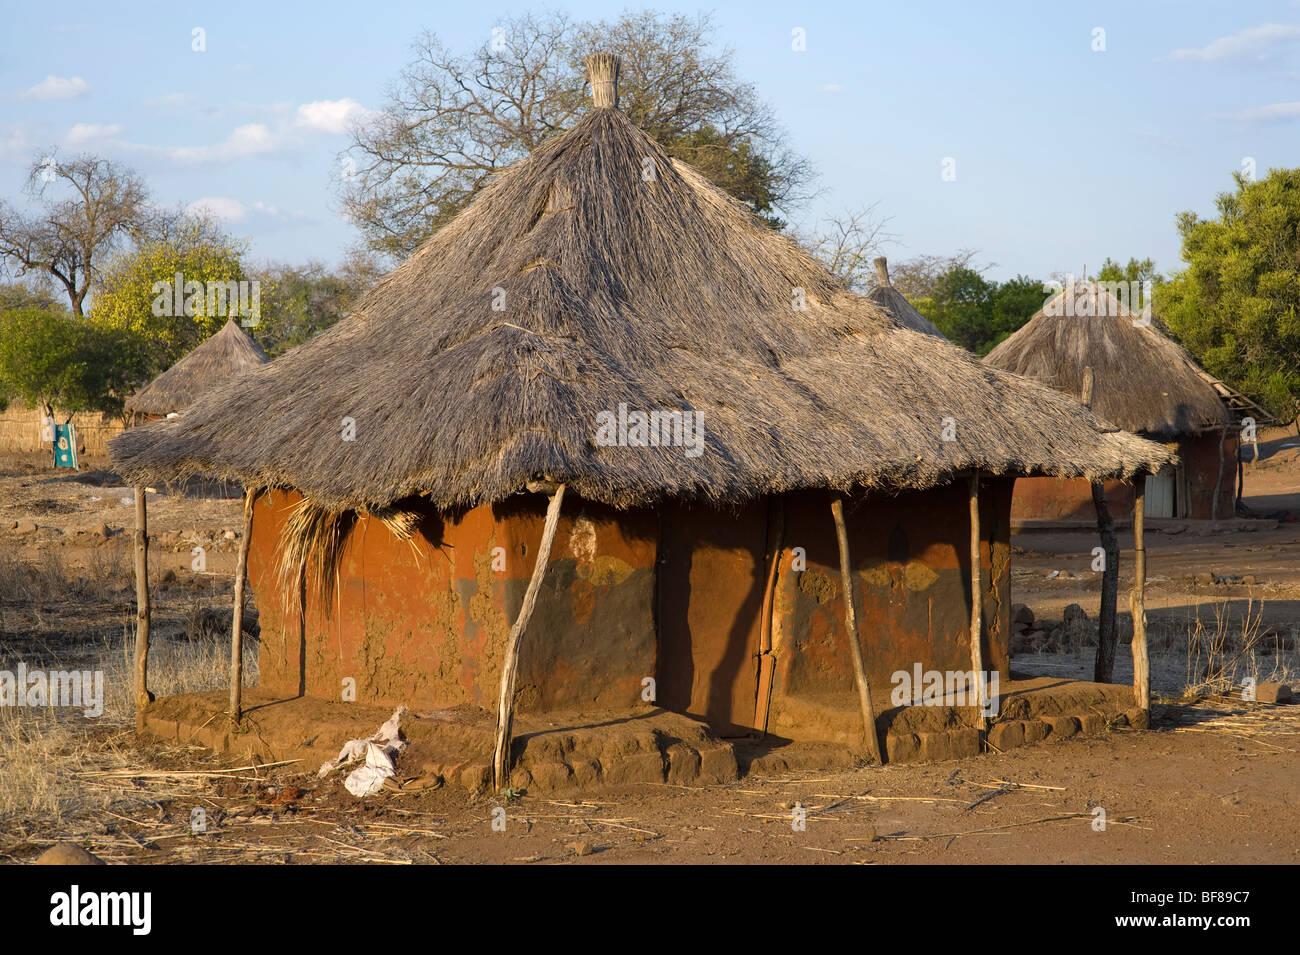 Traditional Zambian huts in Nsongwe village near Livingstone. Stock Photo